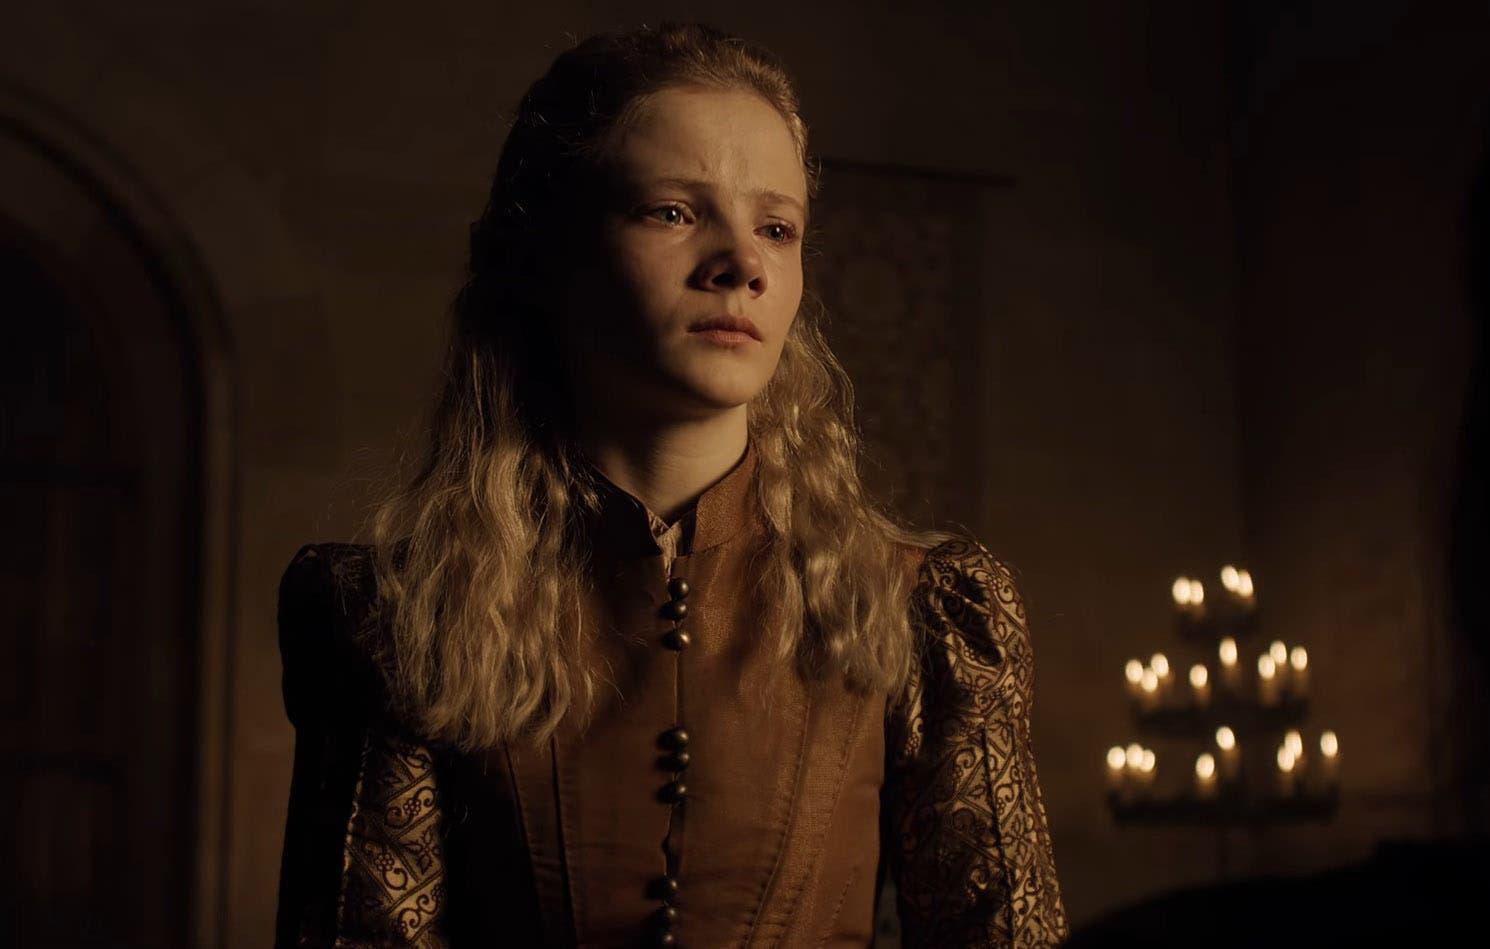 Ciri iba a ser la protagonista de la serie de The Witcher originalmente 10